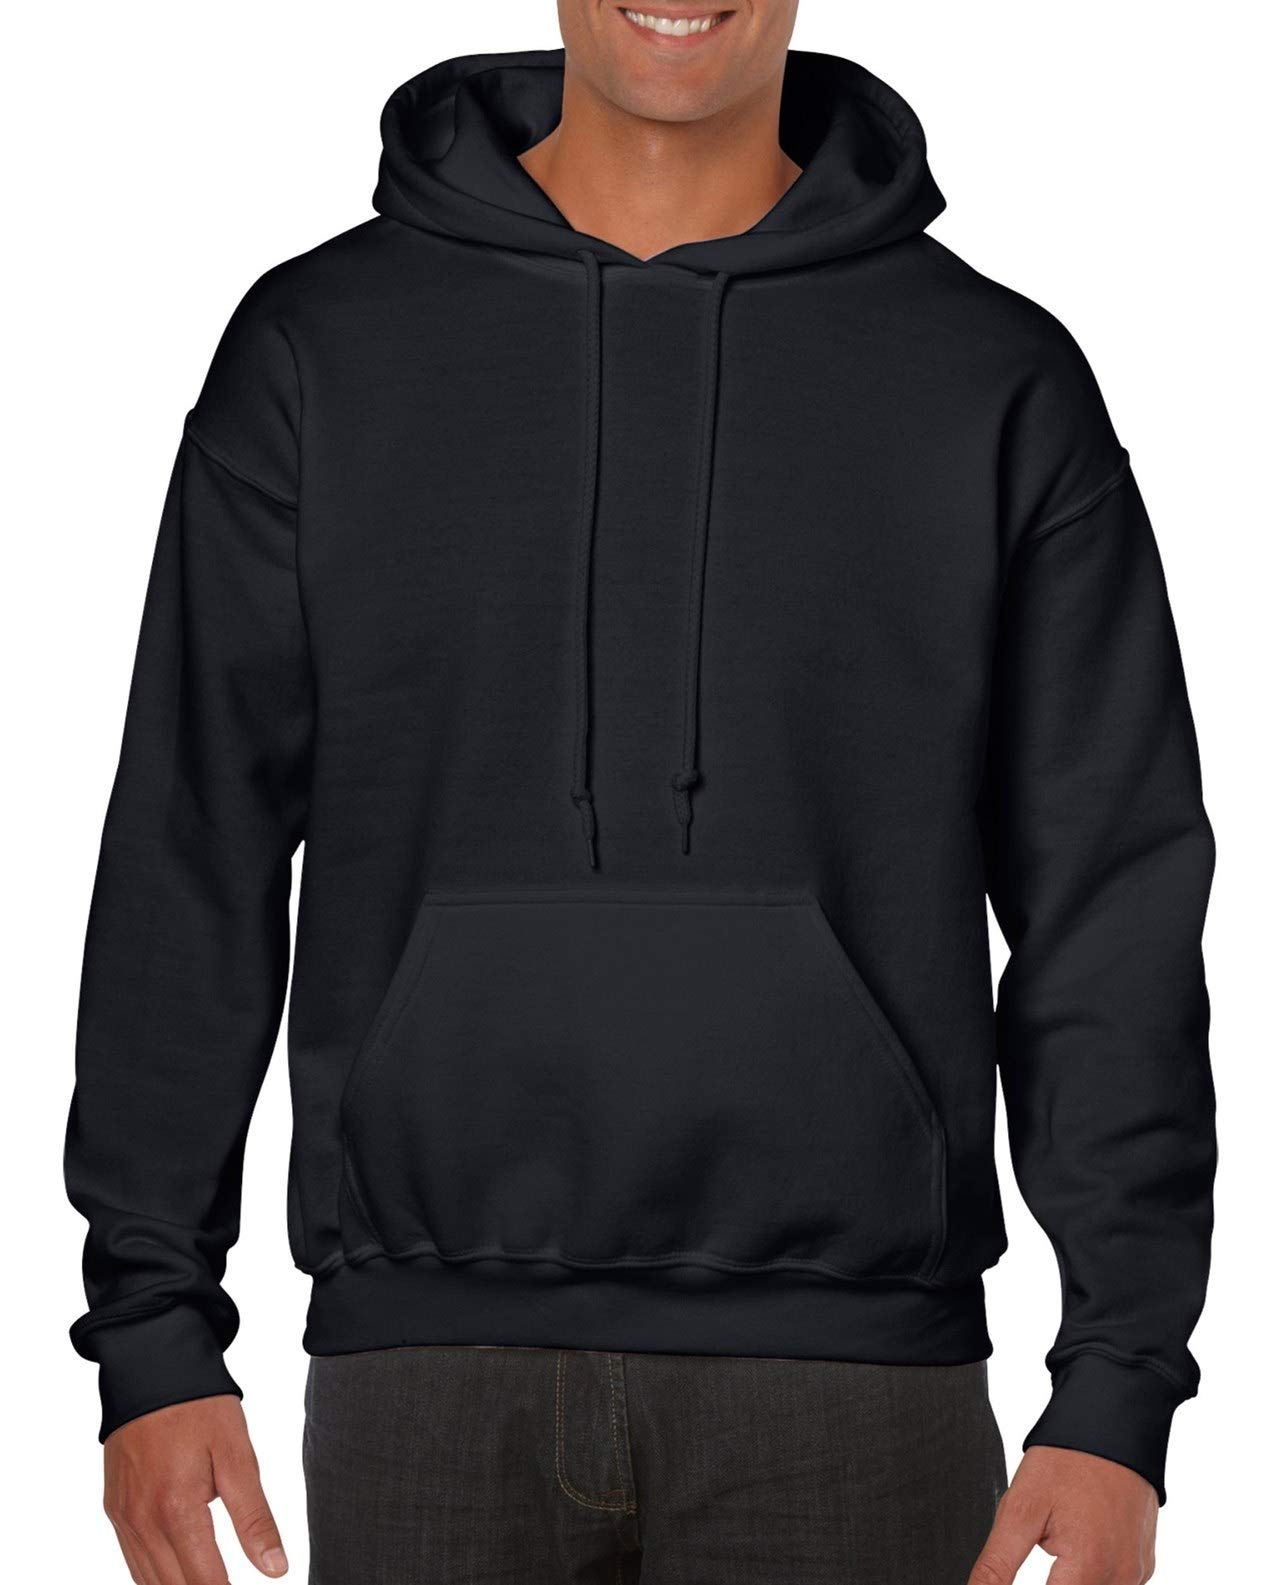 3492fa40 Best Rated in Men's Hoodies & Sweatshirts & Helpful Customer ...